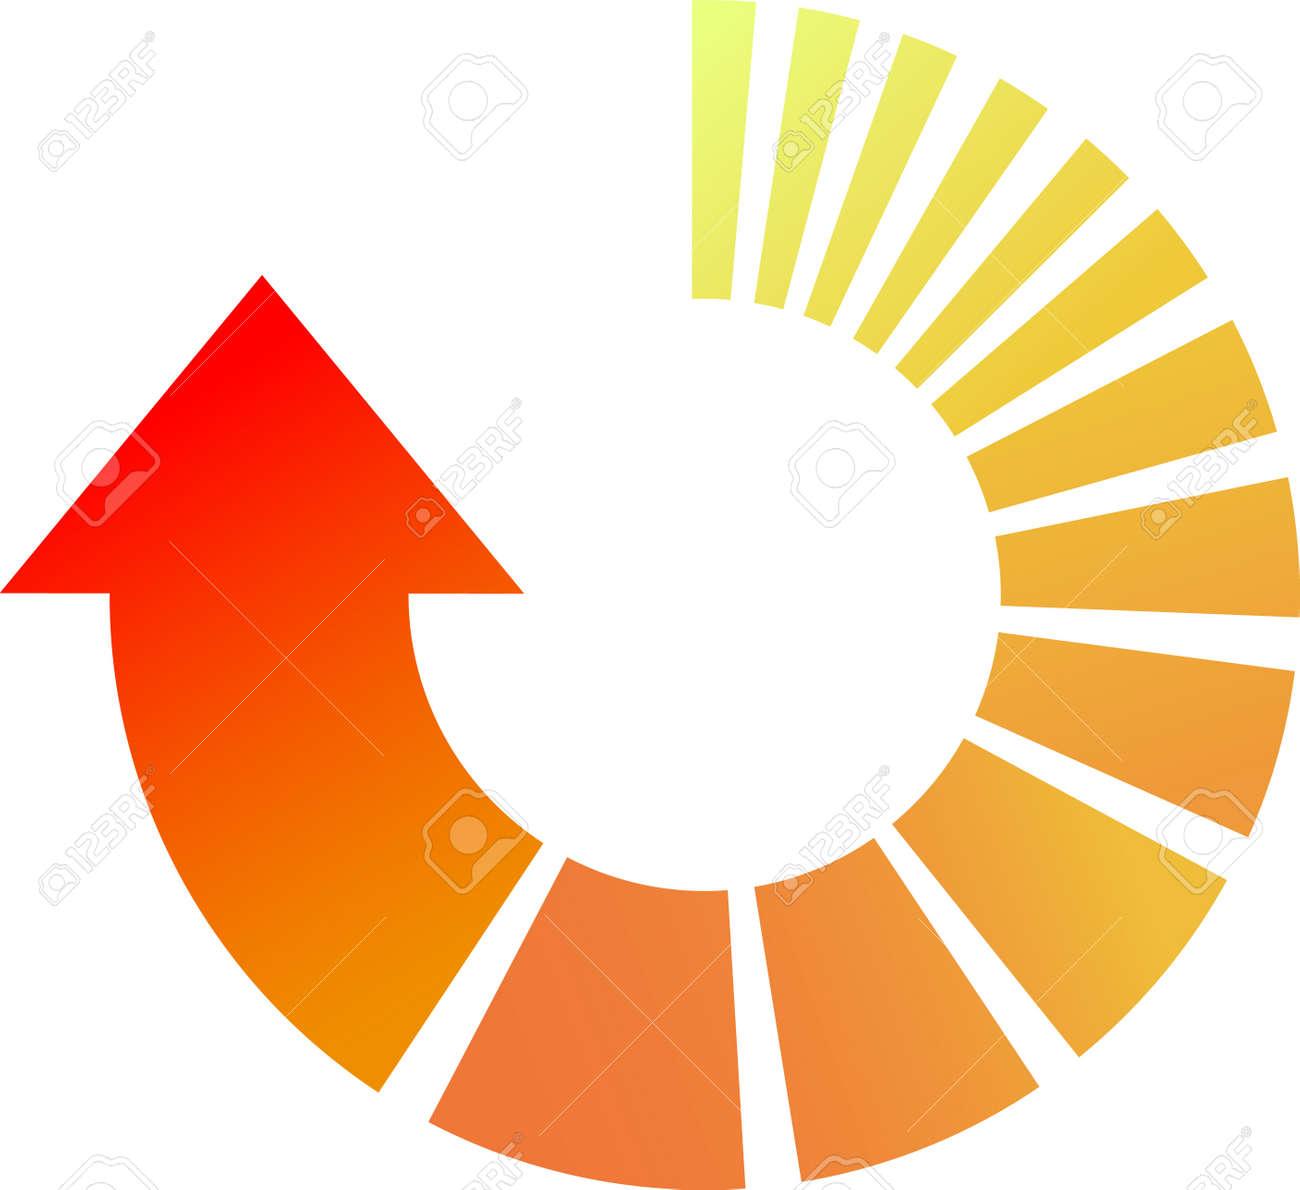 A Colourful Vector Cicular Arrow Illustration Stock Vector - 7916718